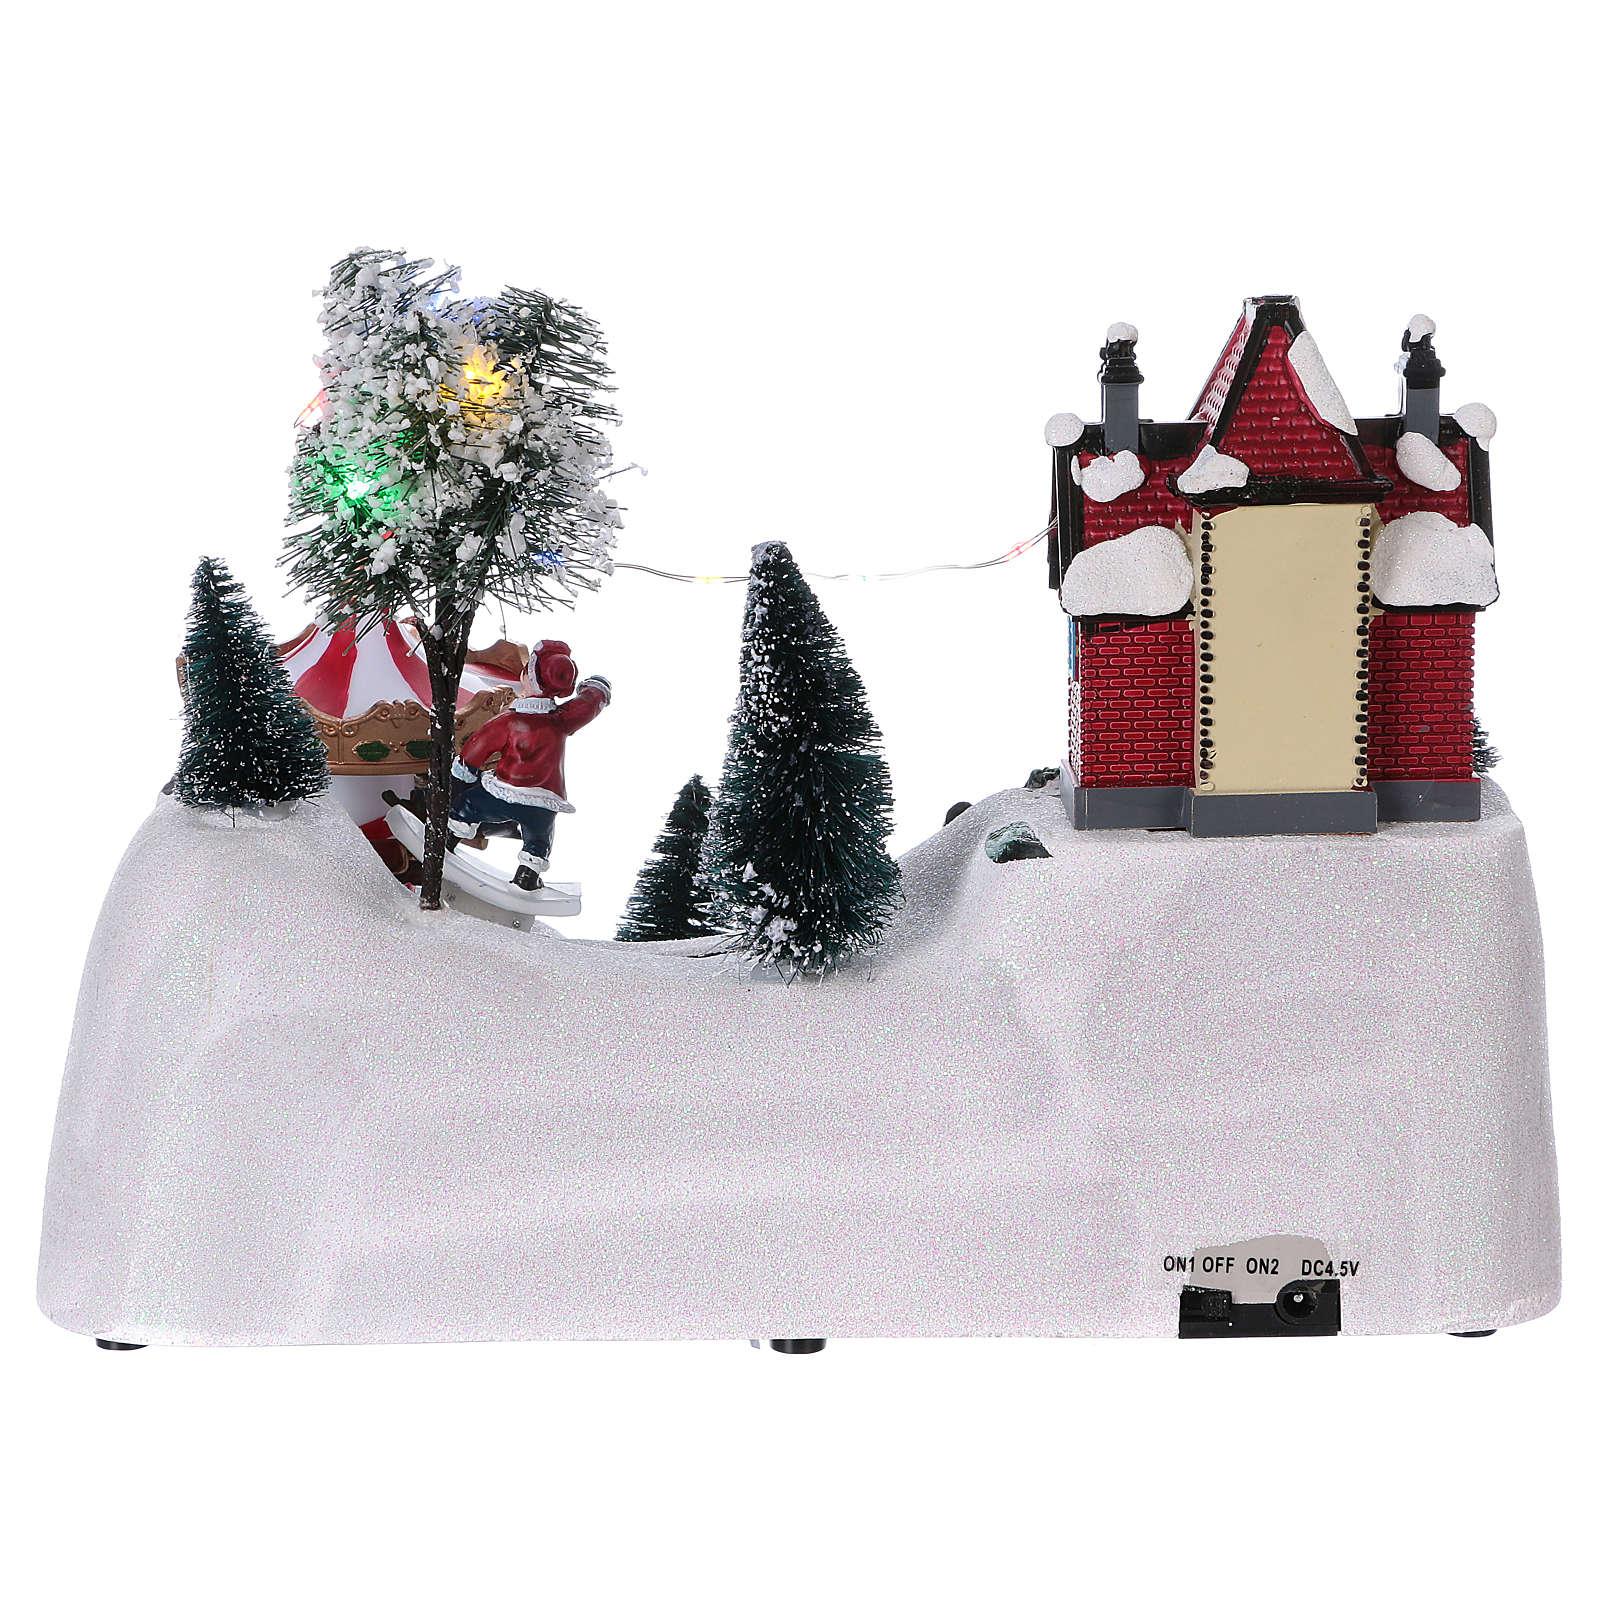 Scène Noël musicale avec carrousel 20x30x15 cm 3